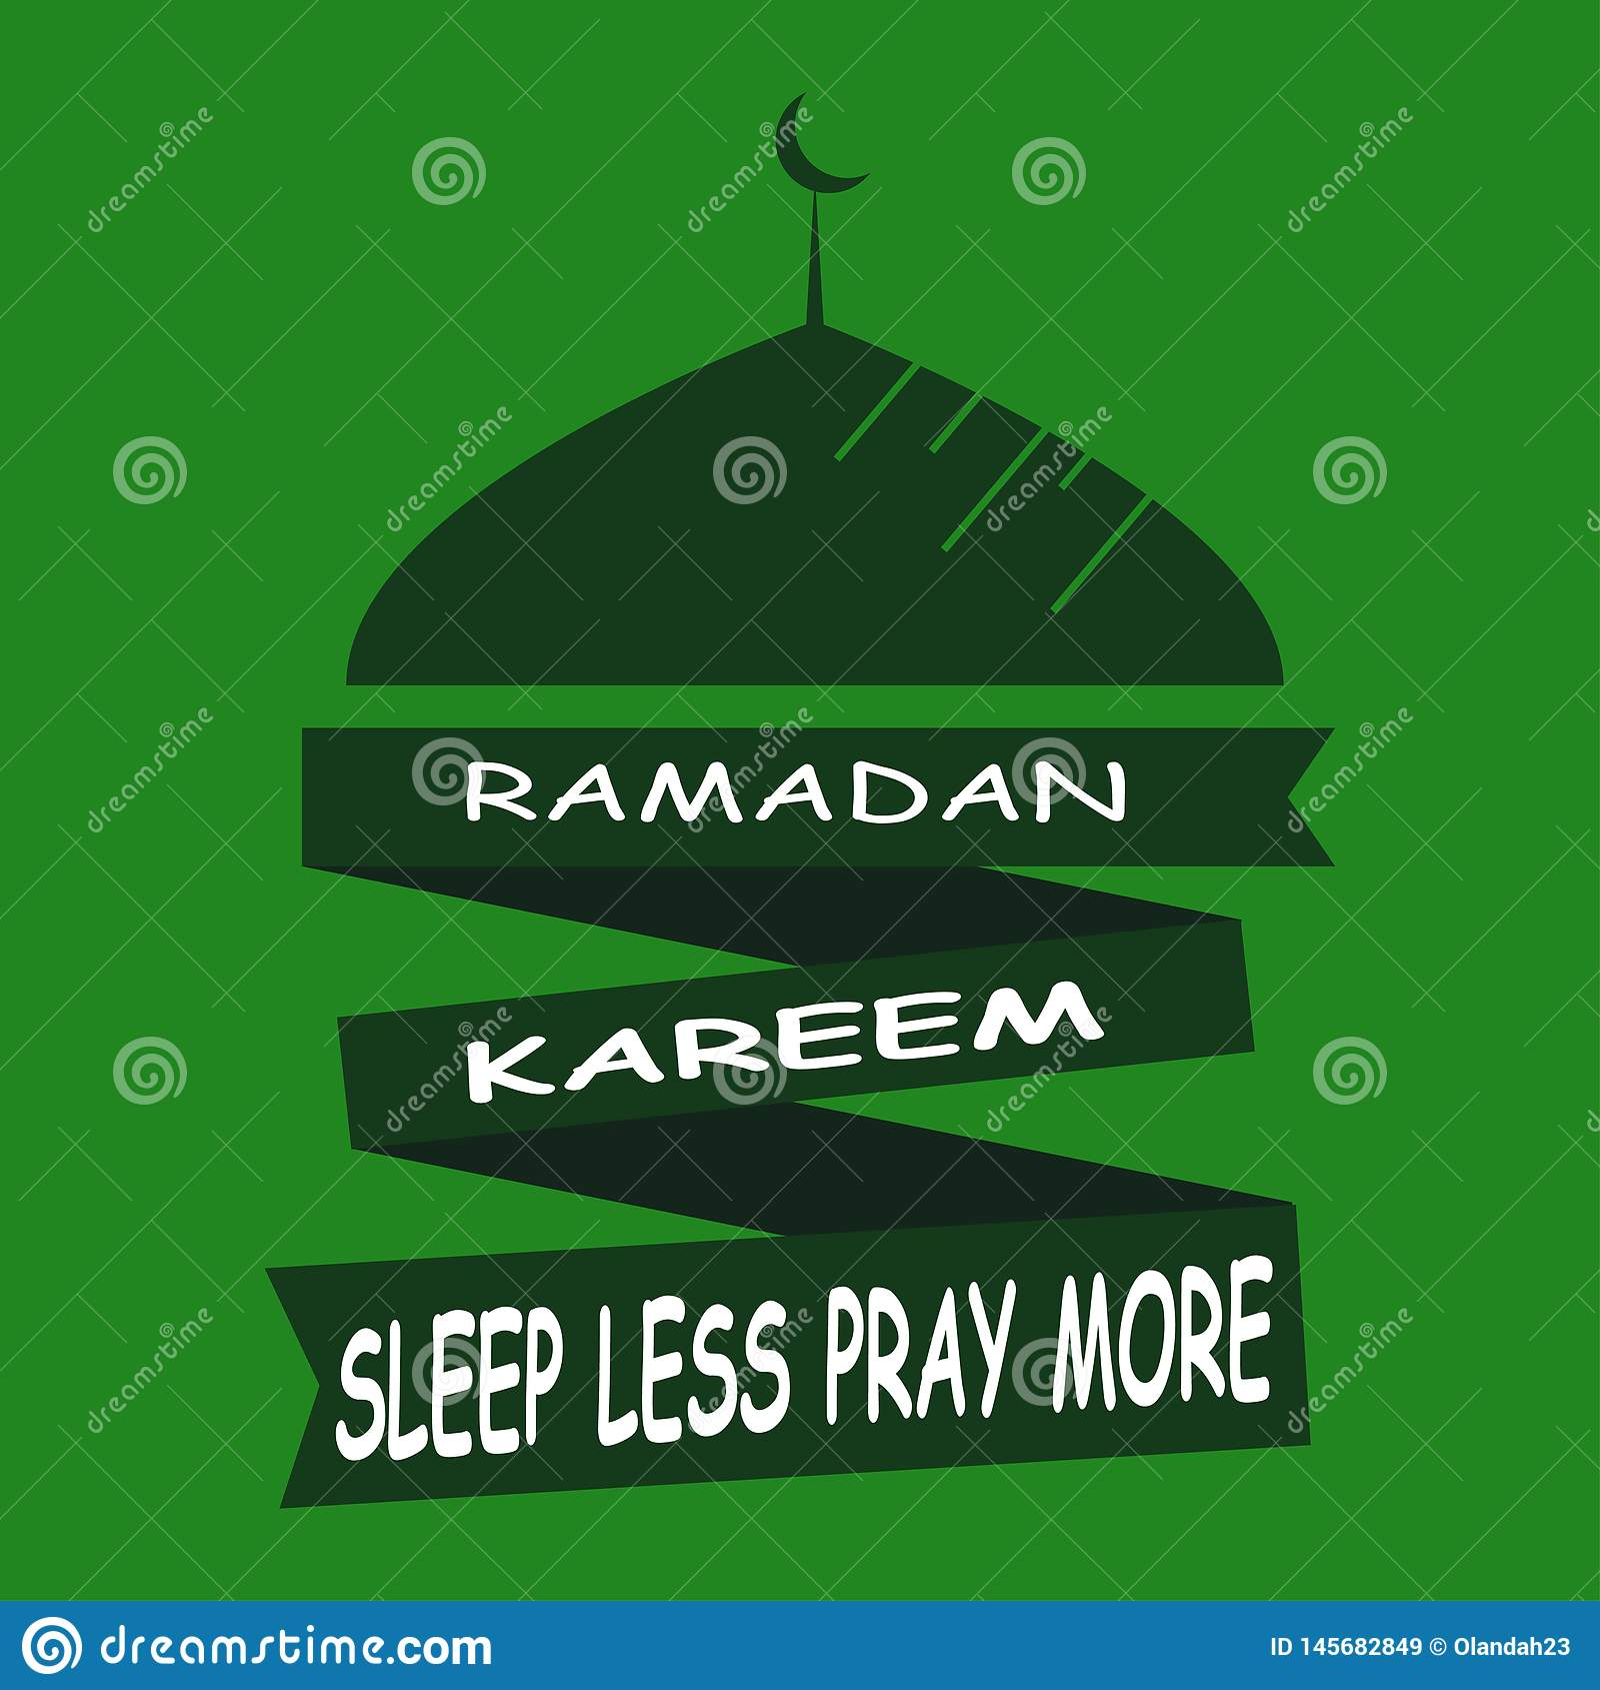 Ramadan Kareem Sleep Less Pray More islamisk designmoskékupol